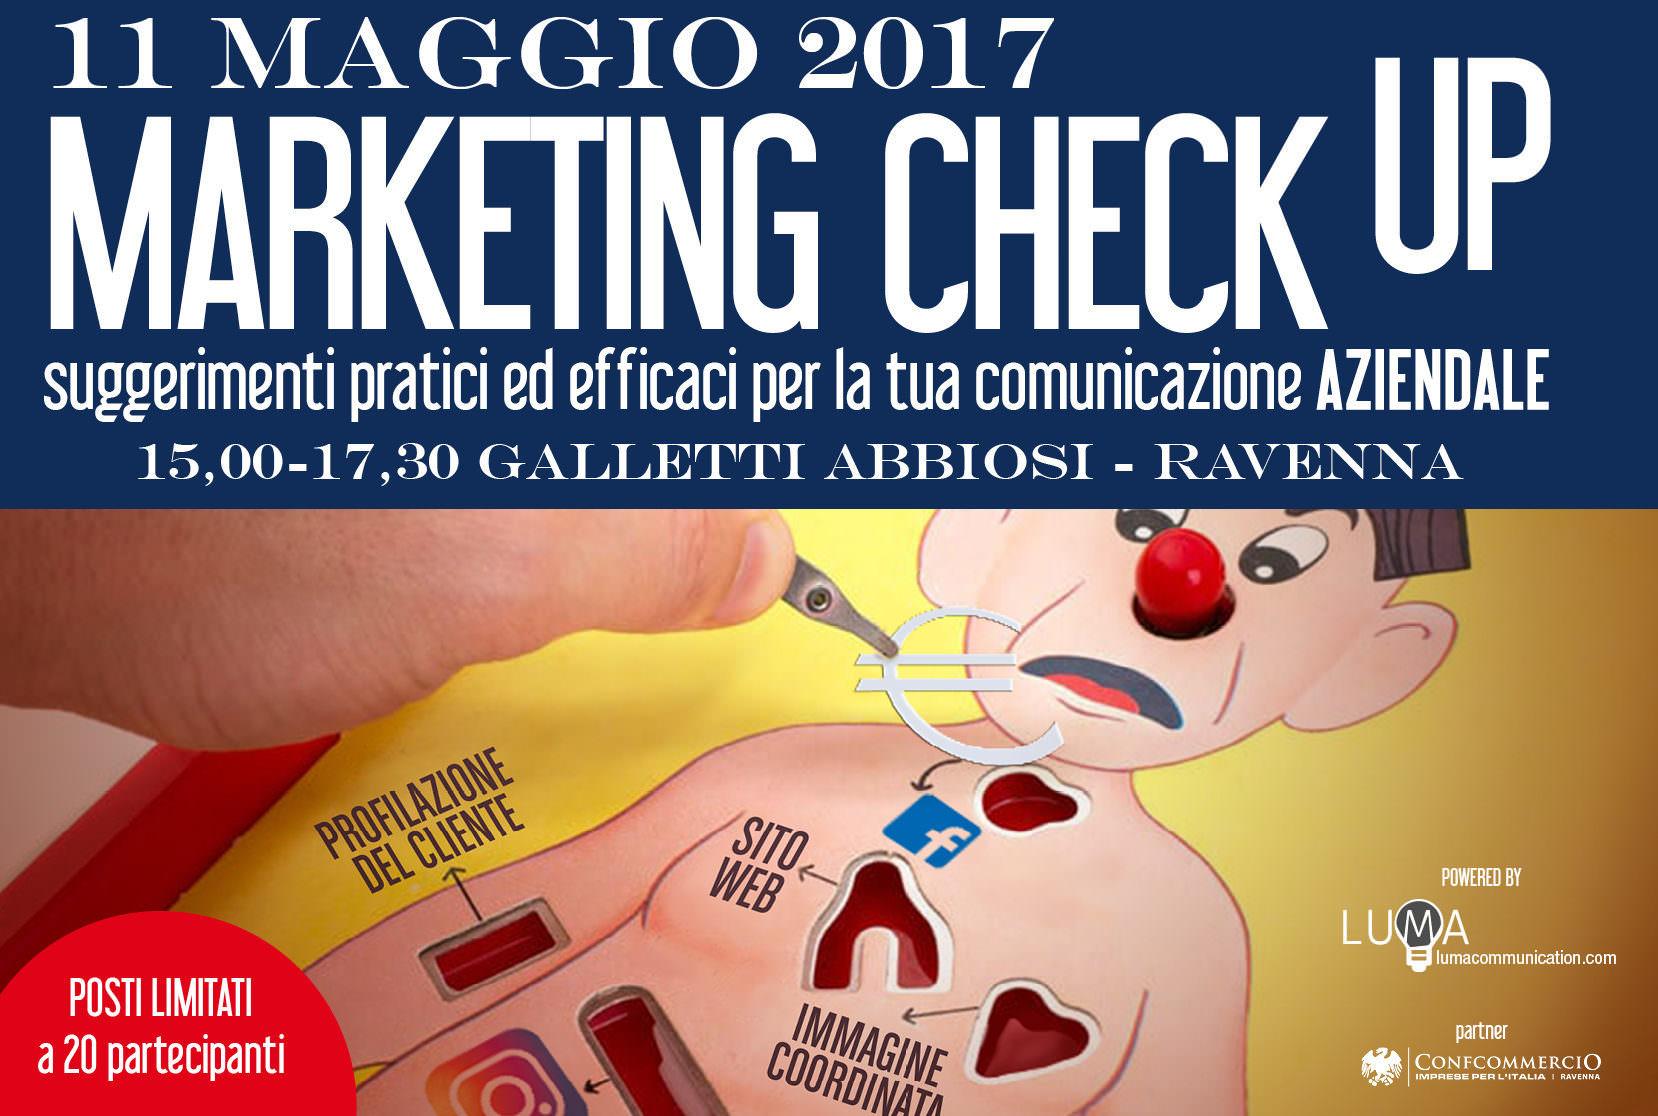 Marketing Check Up